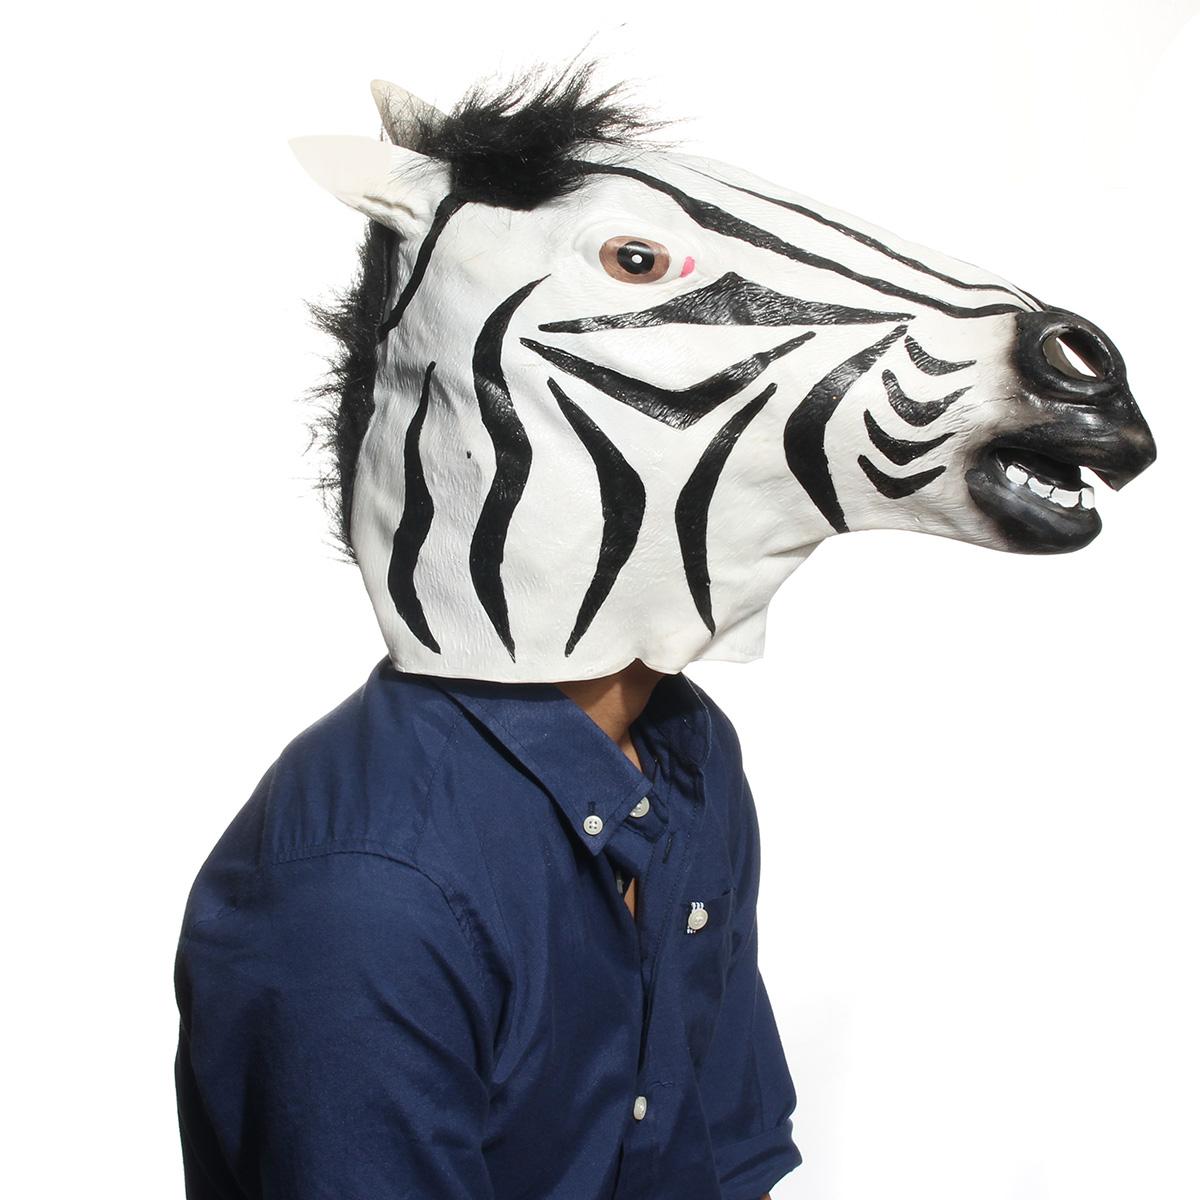 31c5b54c6f2db Funny Zebra Latex Head Mask Animal Cosplay For Halloween Costume Festival